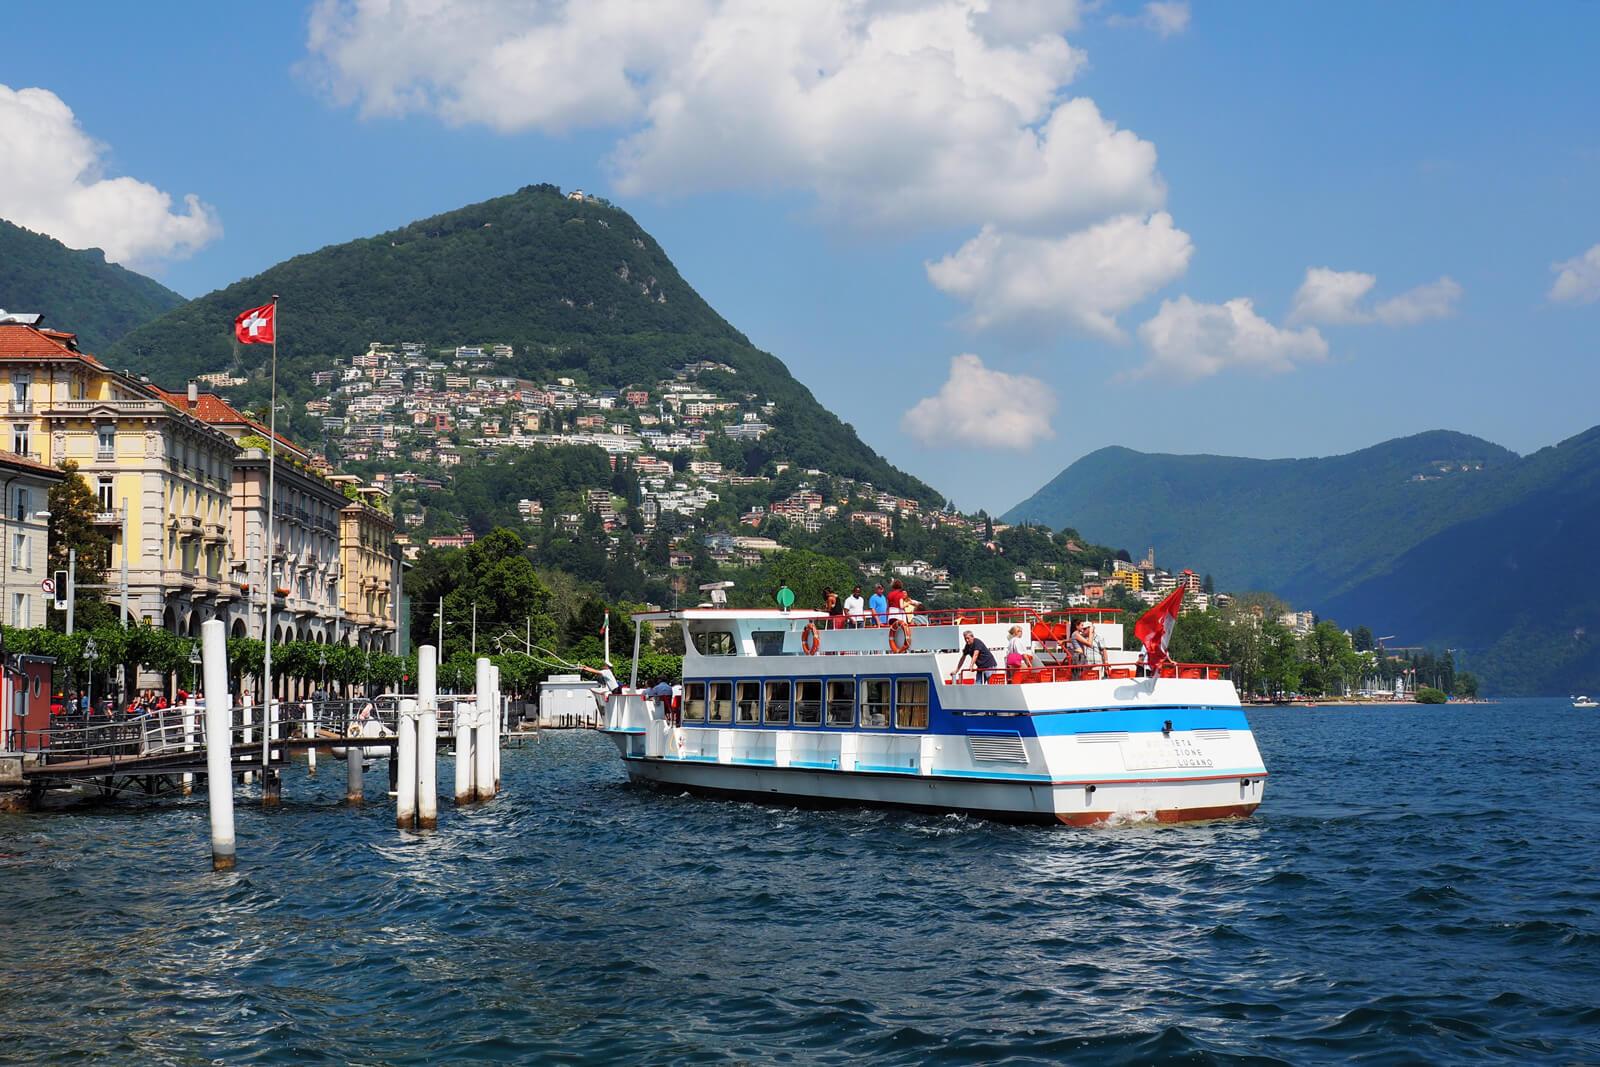 Lugano Lakeside during Summer